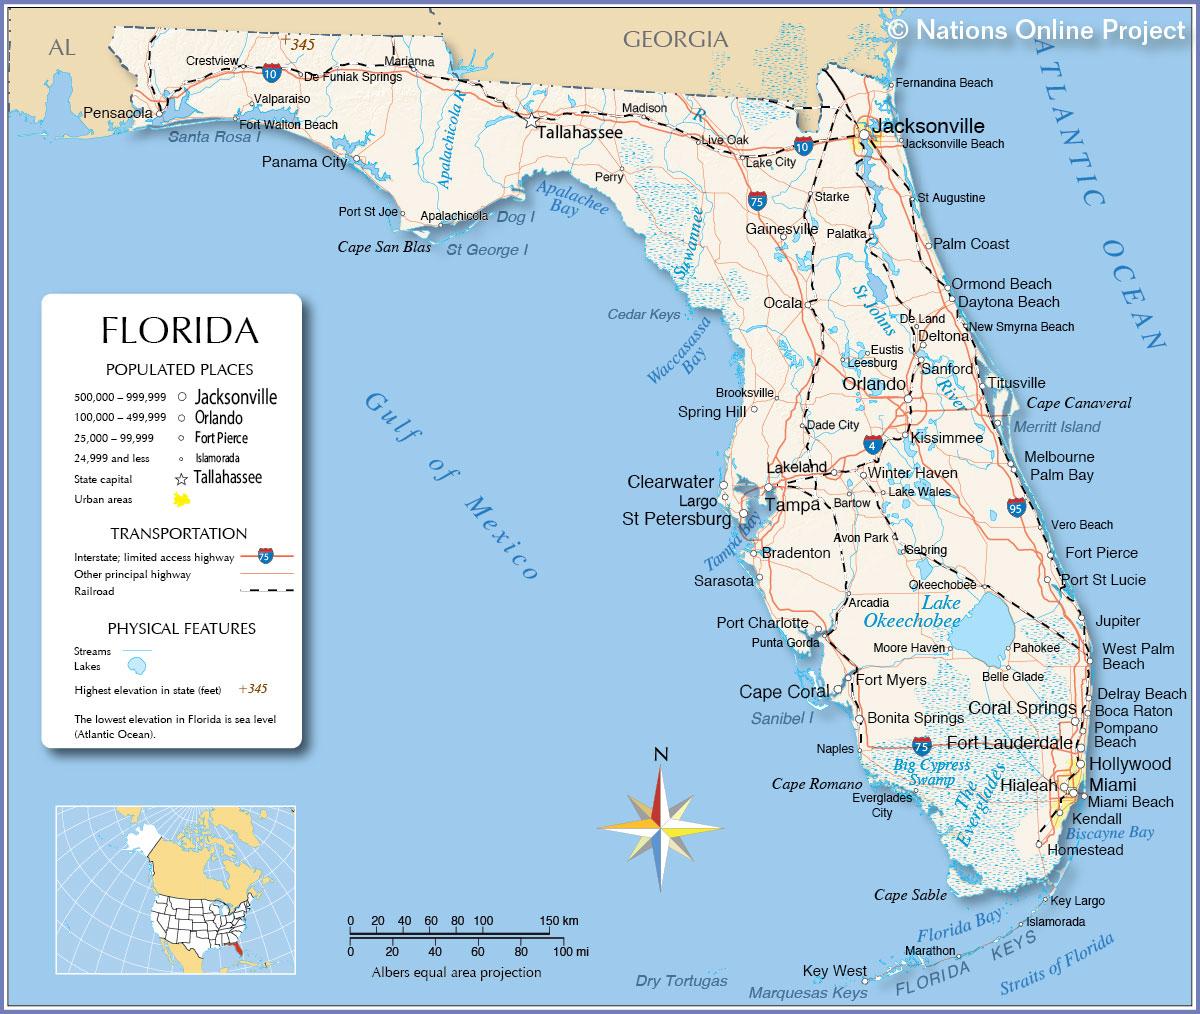 1200X1014Px Wallpaper Daytona Beach Fl - Wallpapersafari - Where Is Daytona Beach Florida On The Map